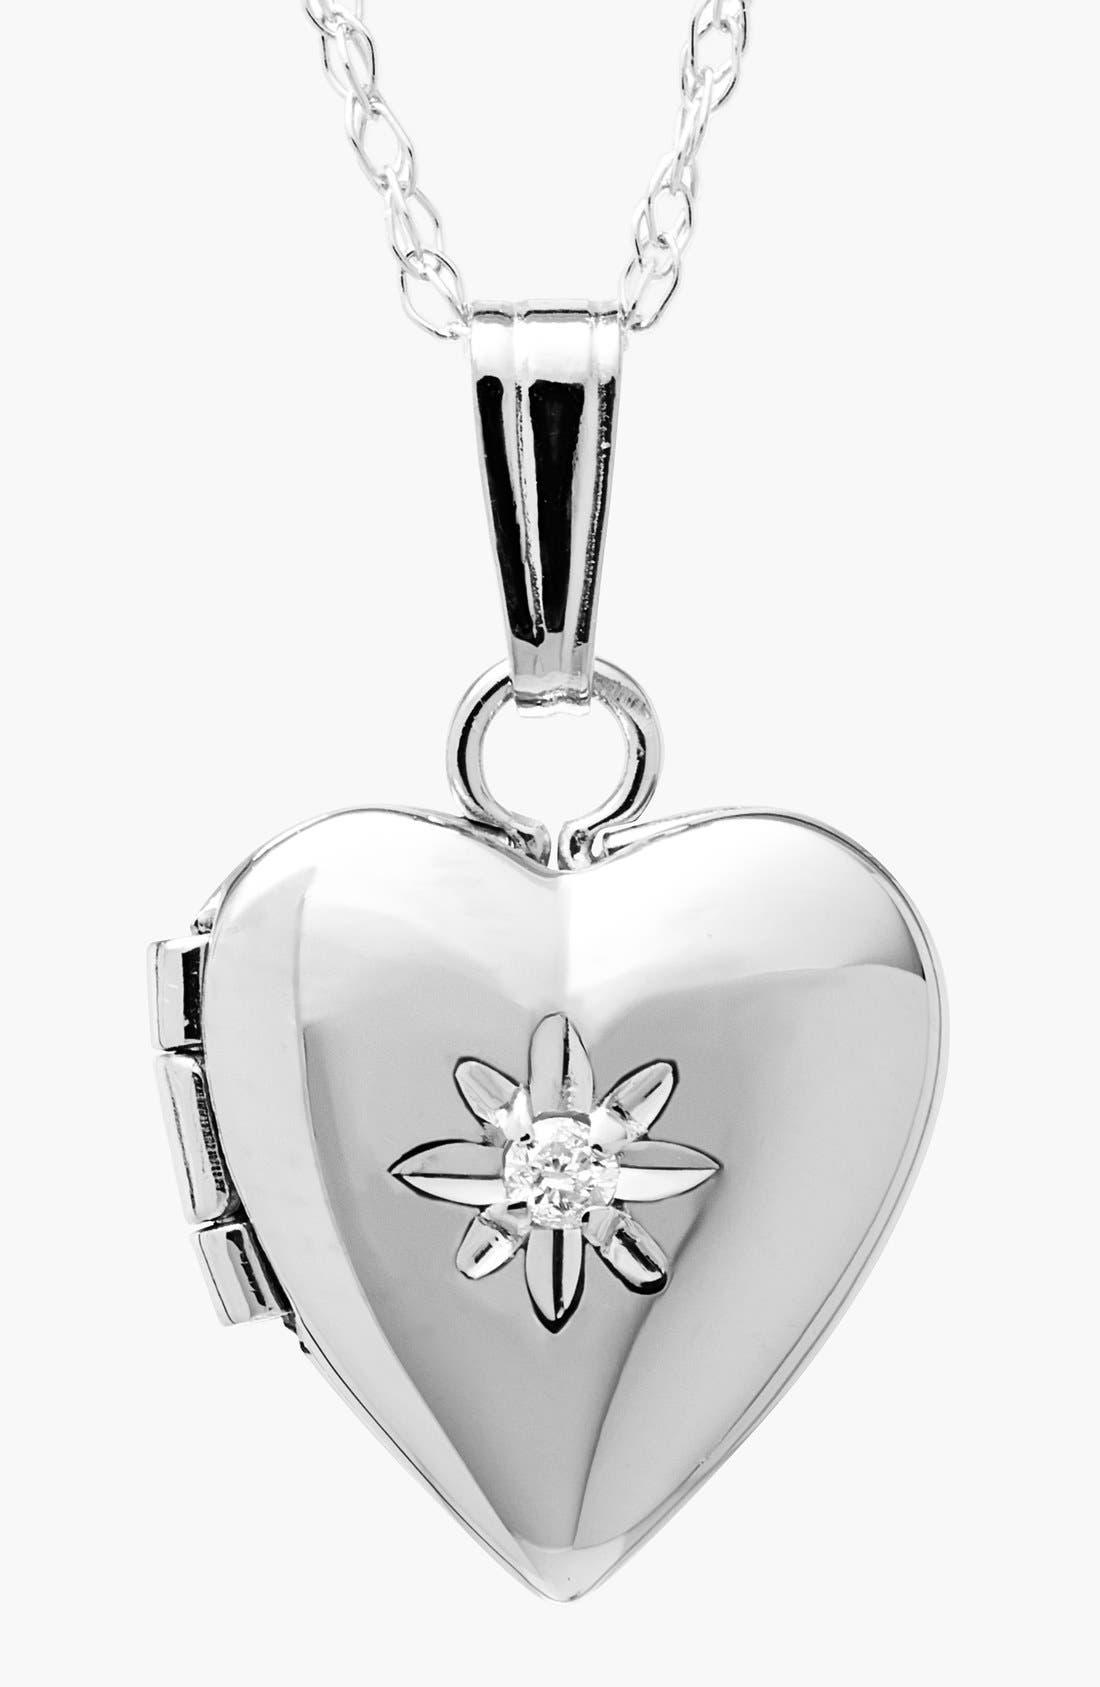 14k White Gold Heart Locket Necklace,                             Main thumbnail 1, color,